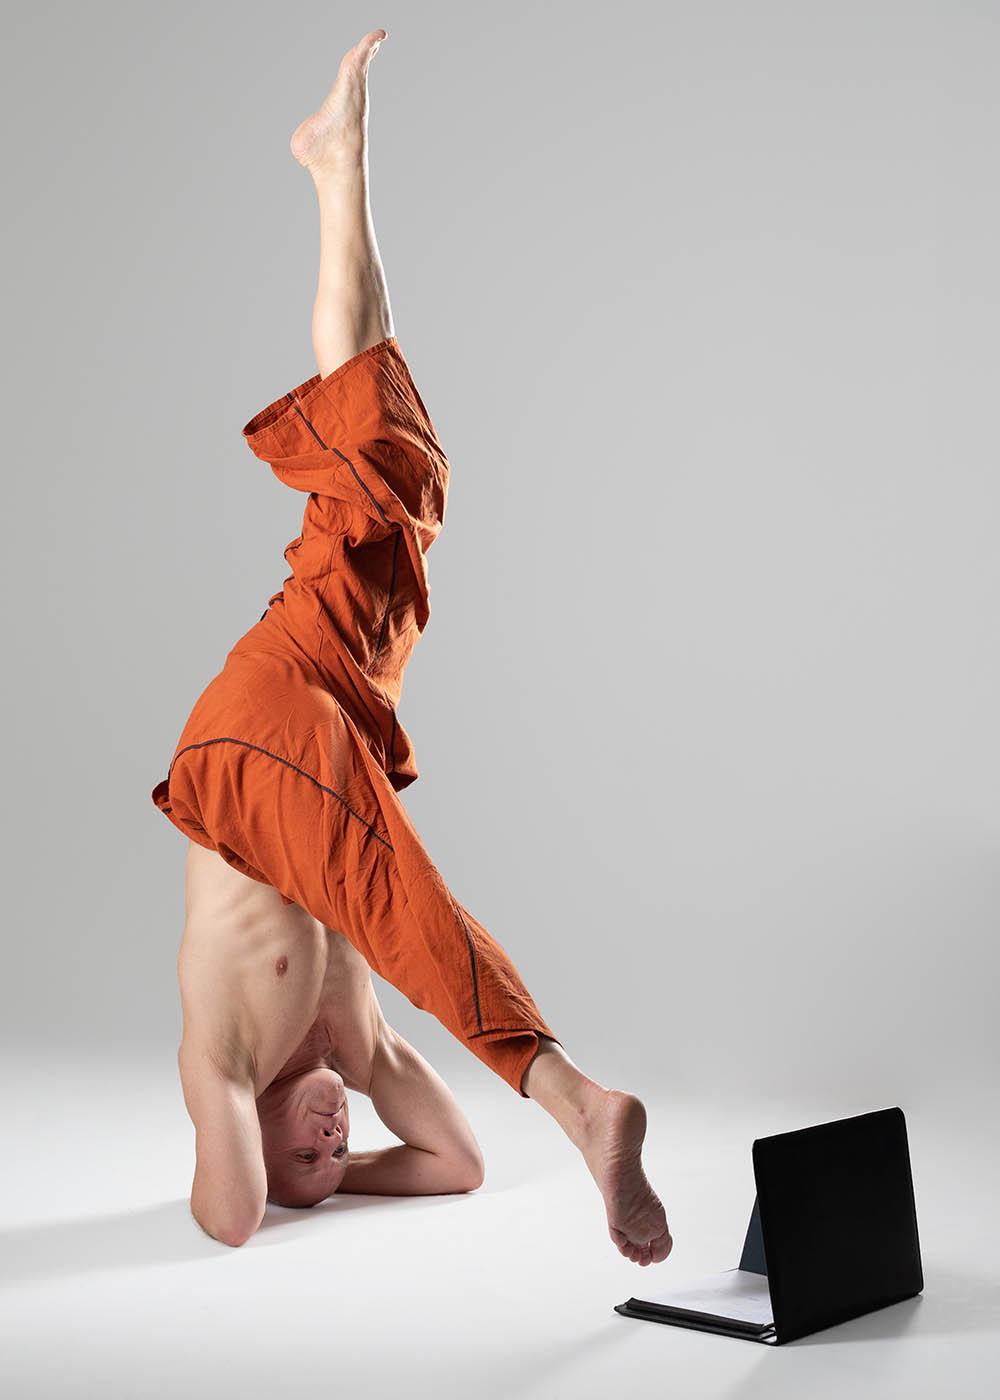 Christian Bechtel macht Handstand vor Laptop